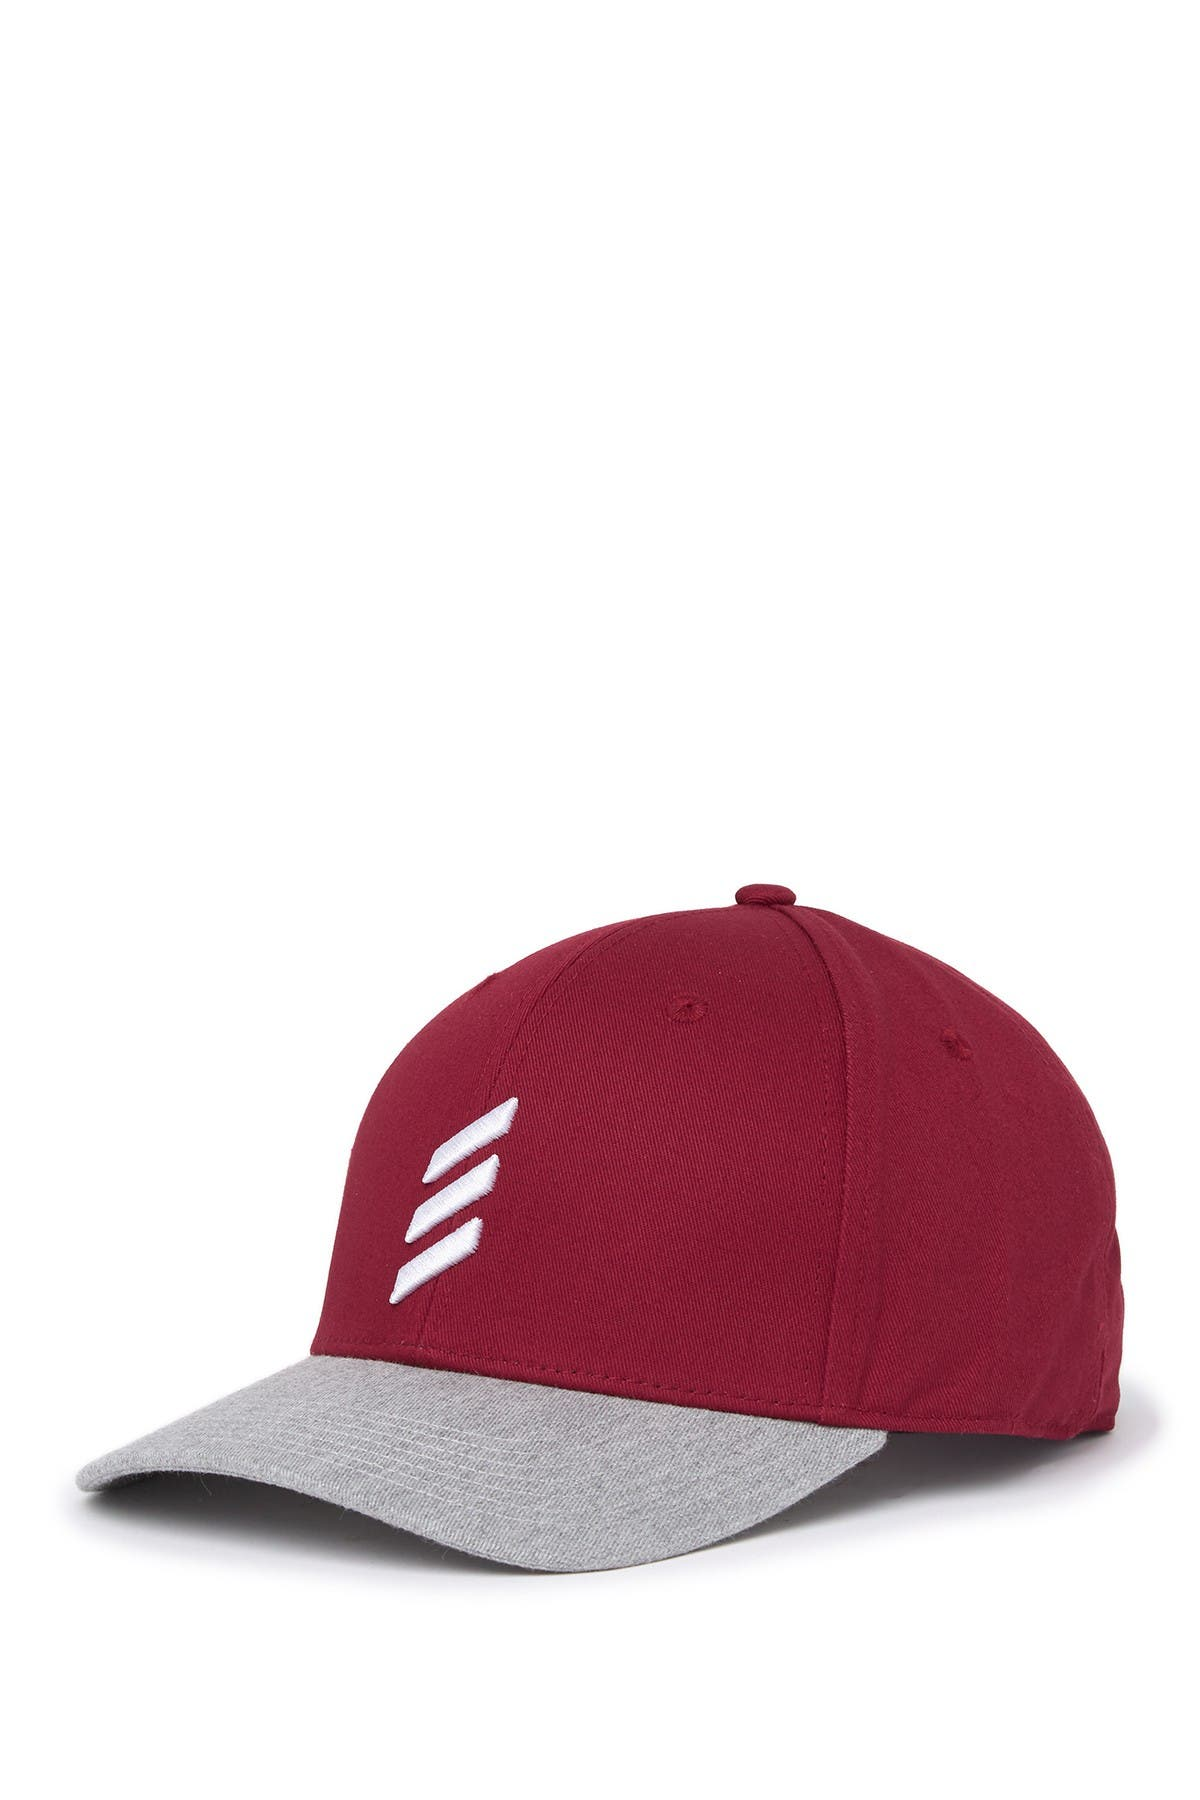 Image of Adidas Golf Bold Stripe Snap Back Hat